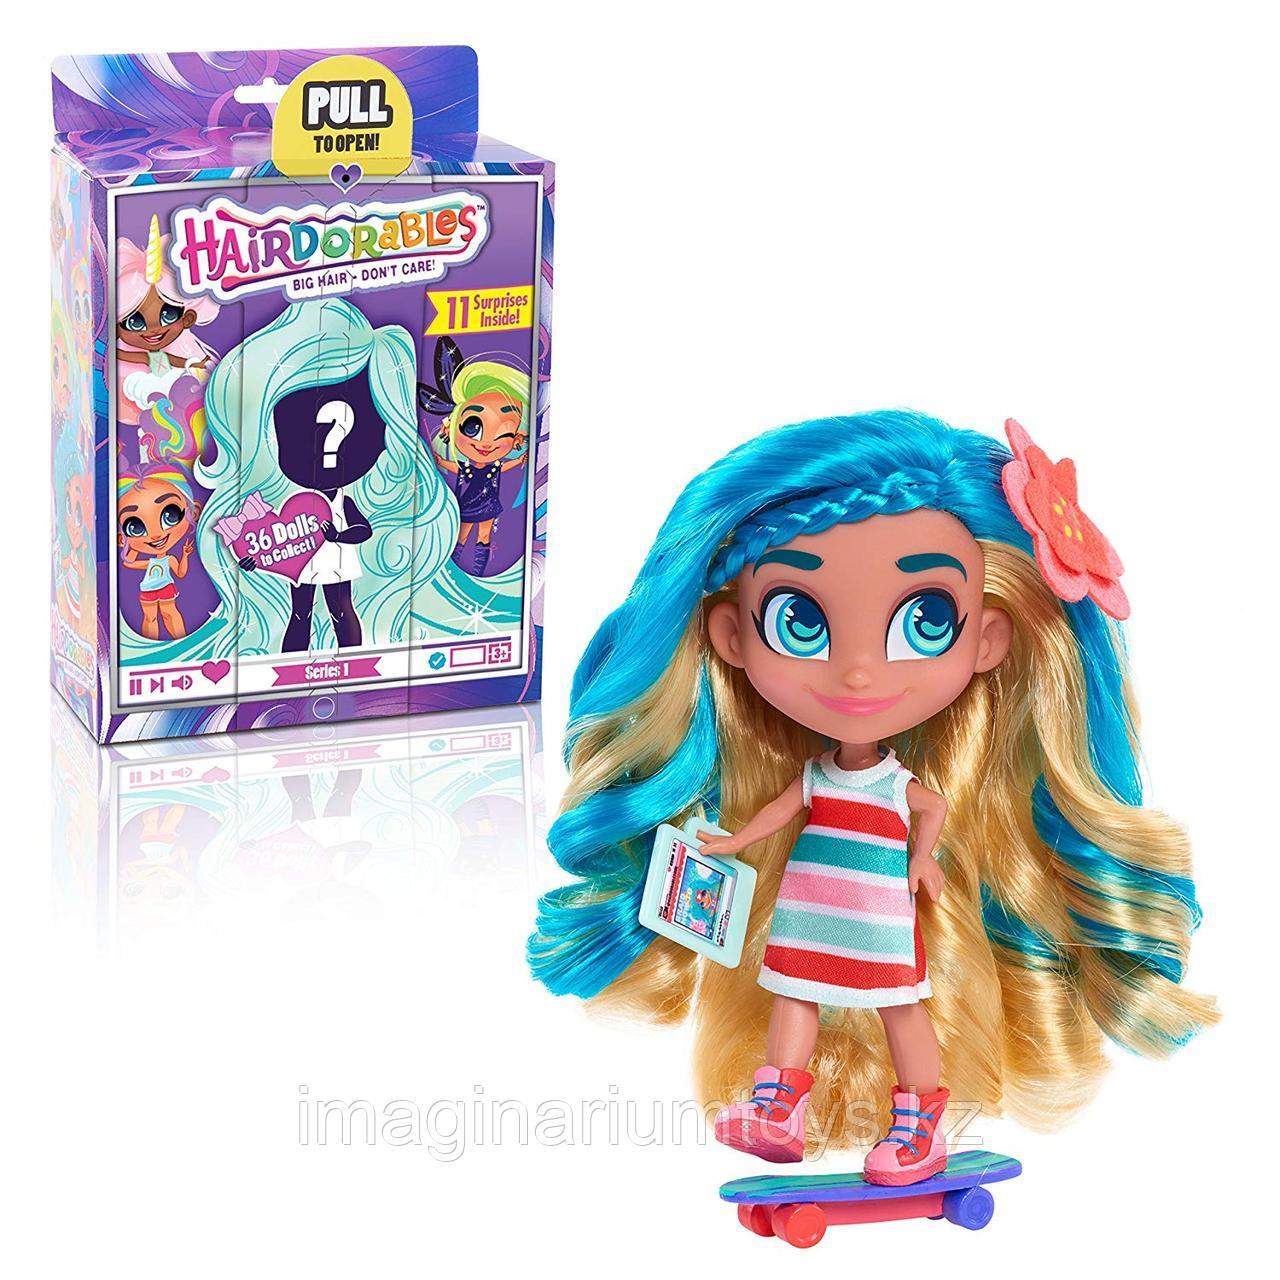 Кукла Hairdorables Хэрдораблс 1 серия